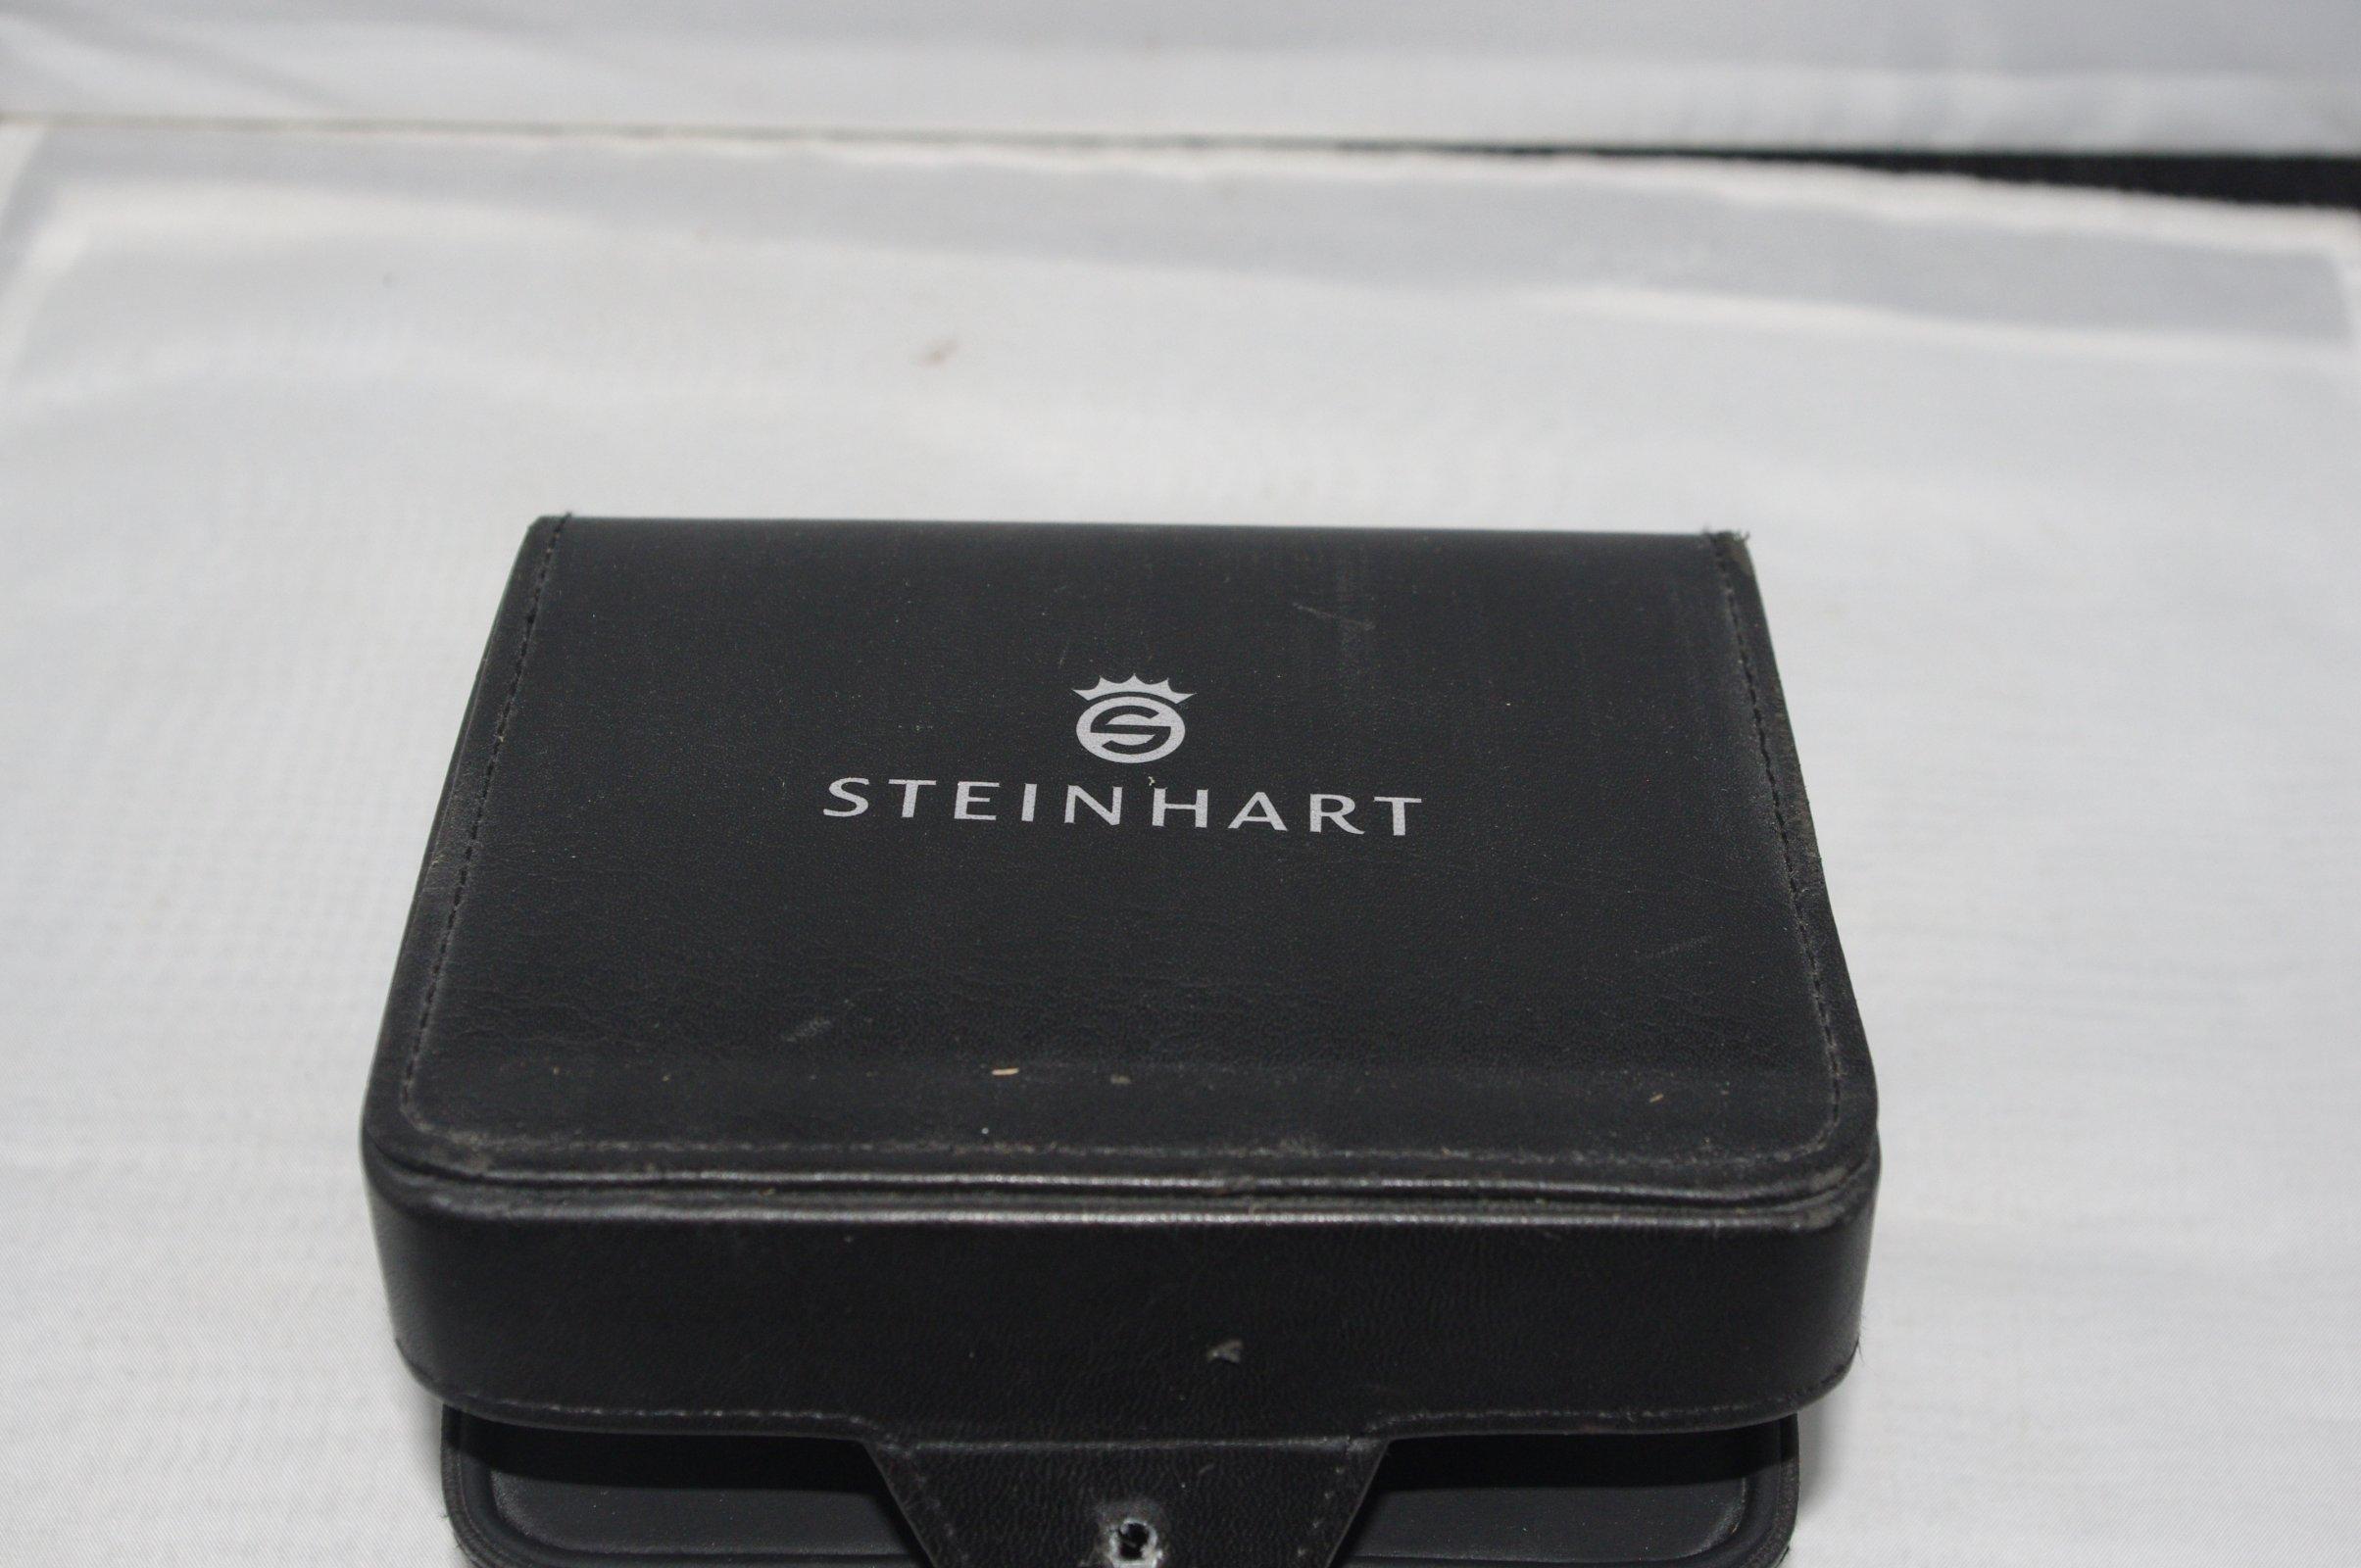 Steinhart (7).JPG